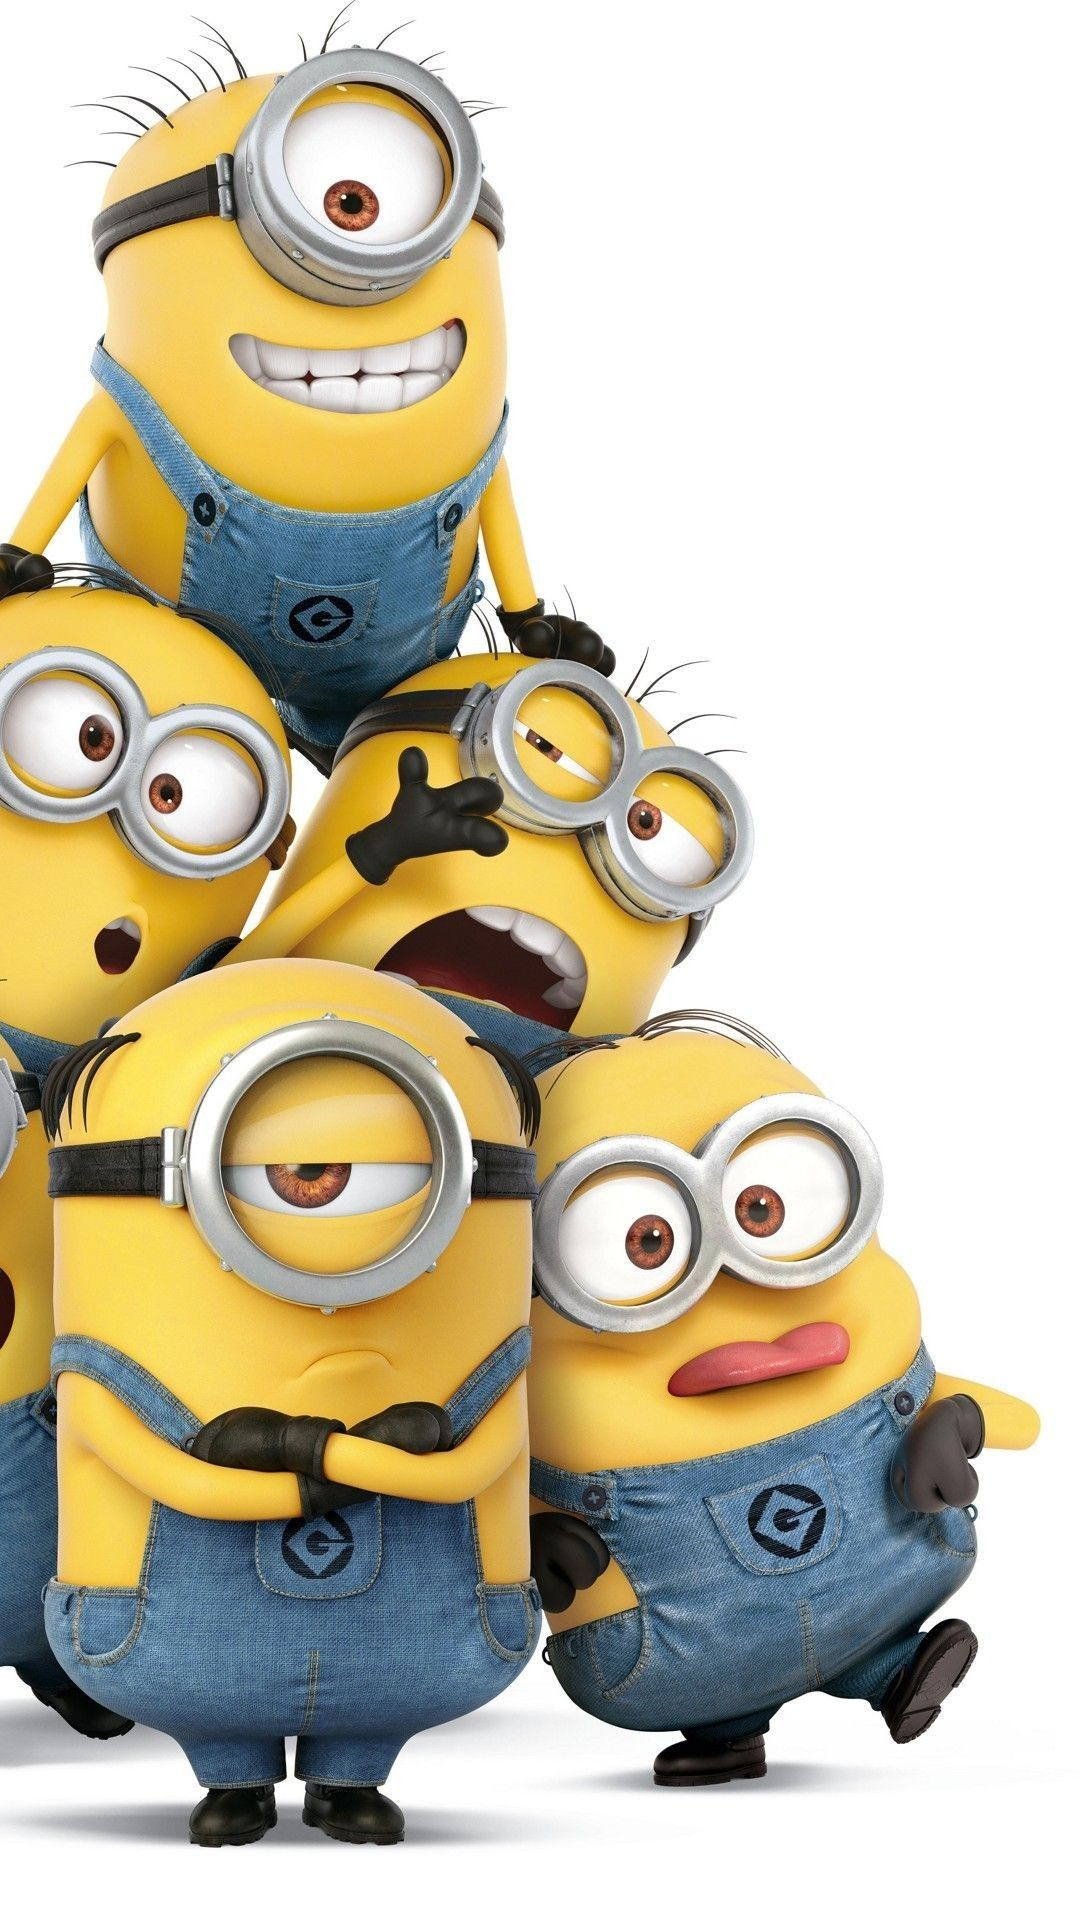 Minions Minions In 2019 Minions Wallpaper Minions Love